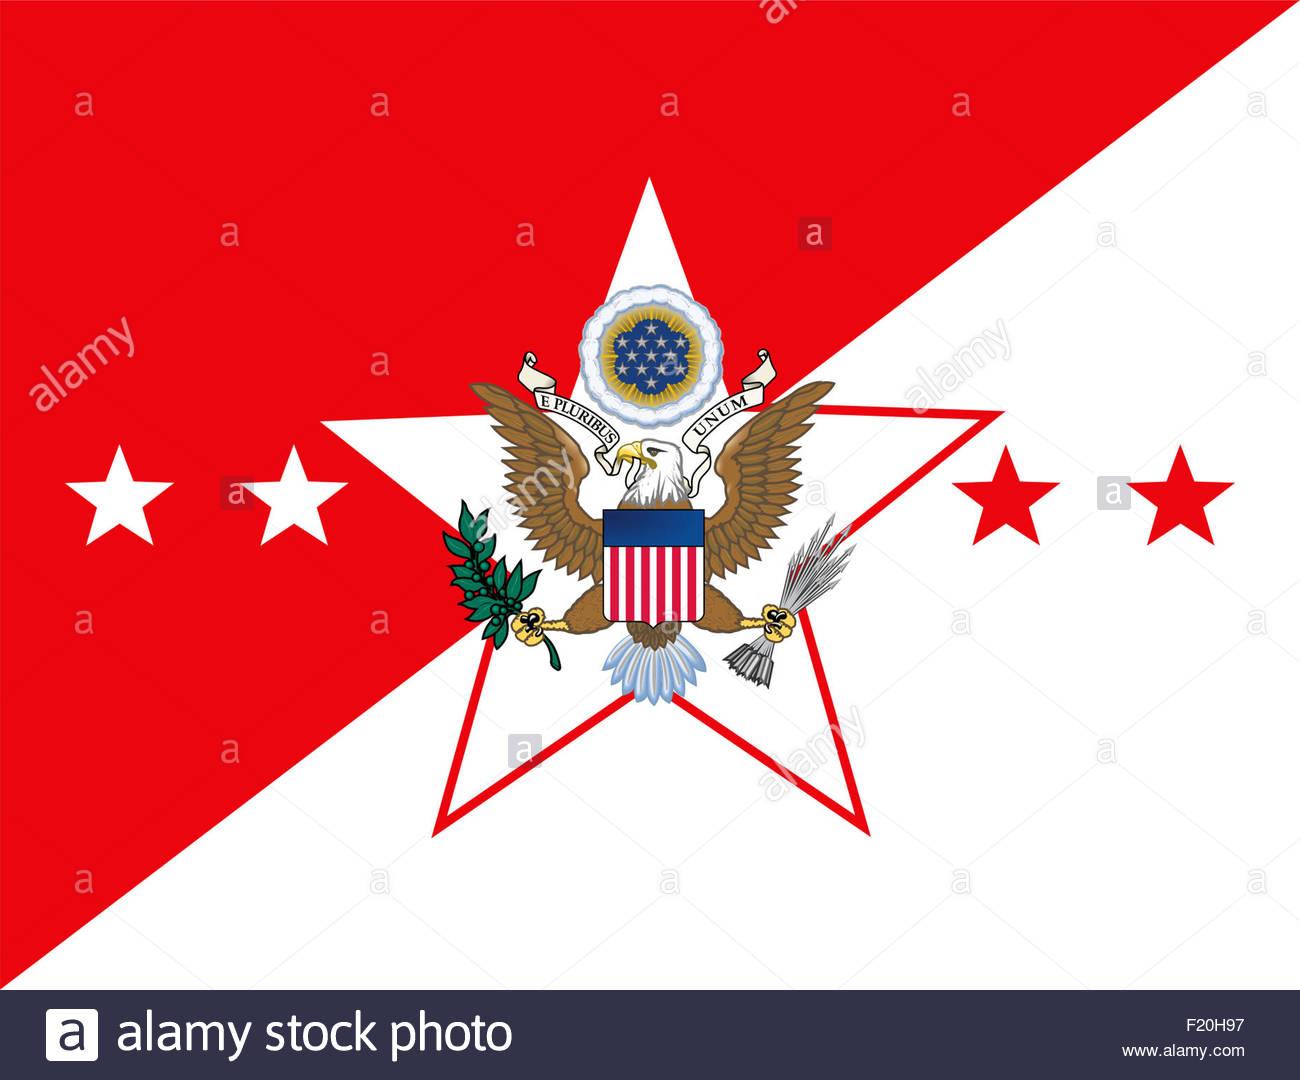 Chief of Staff Army CSA logo icon - Stock Image